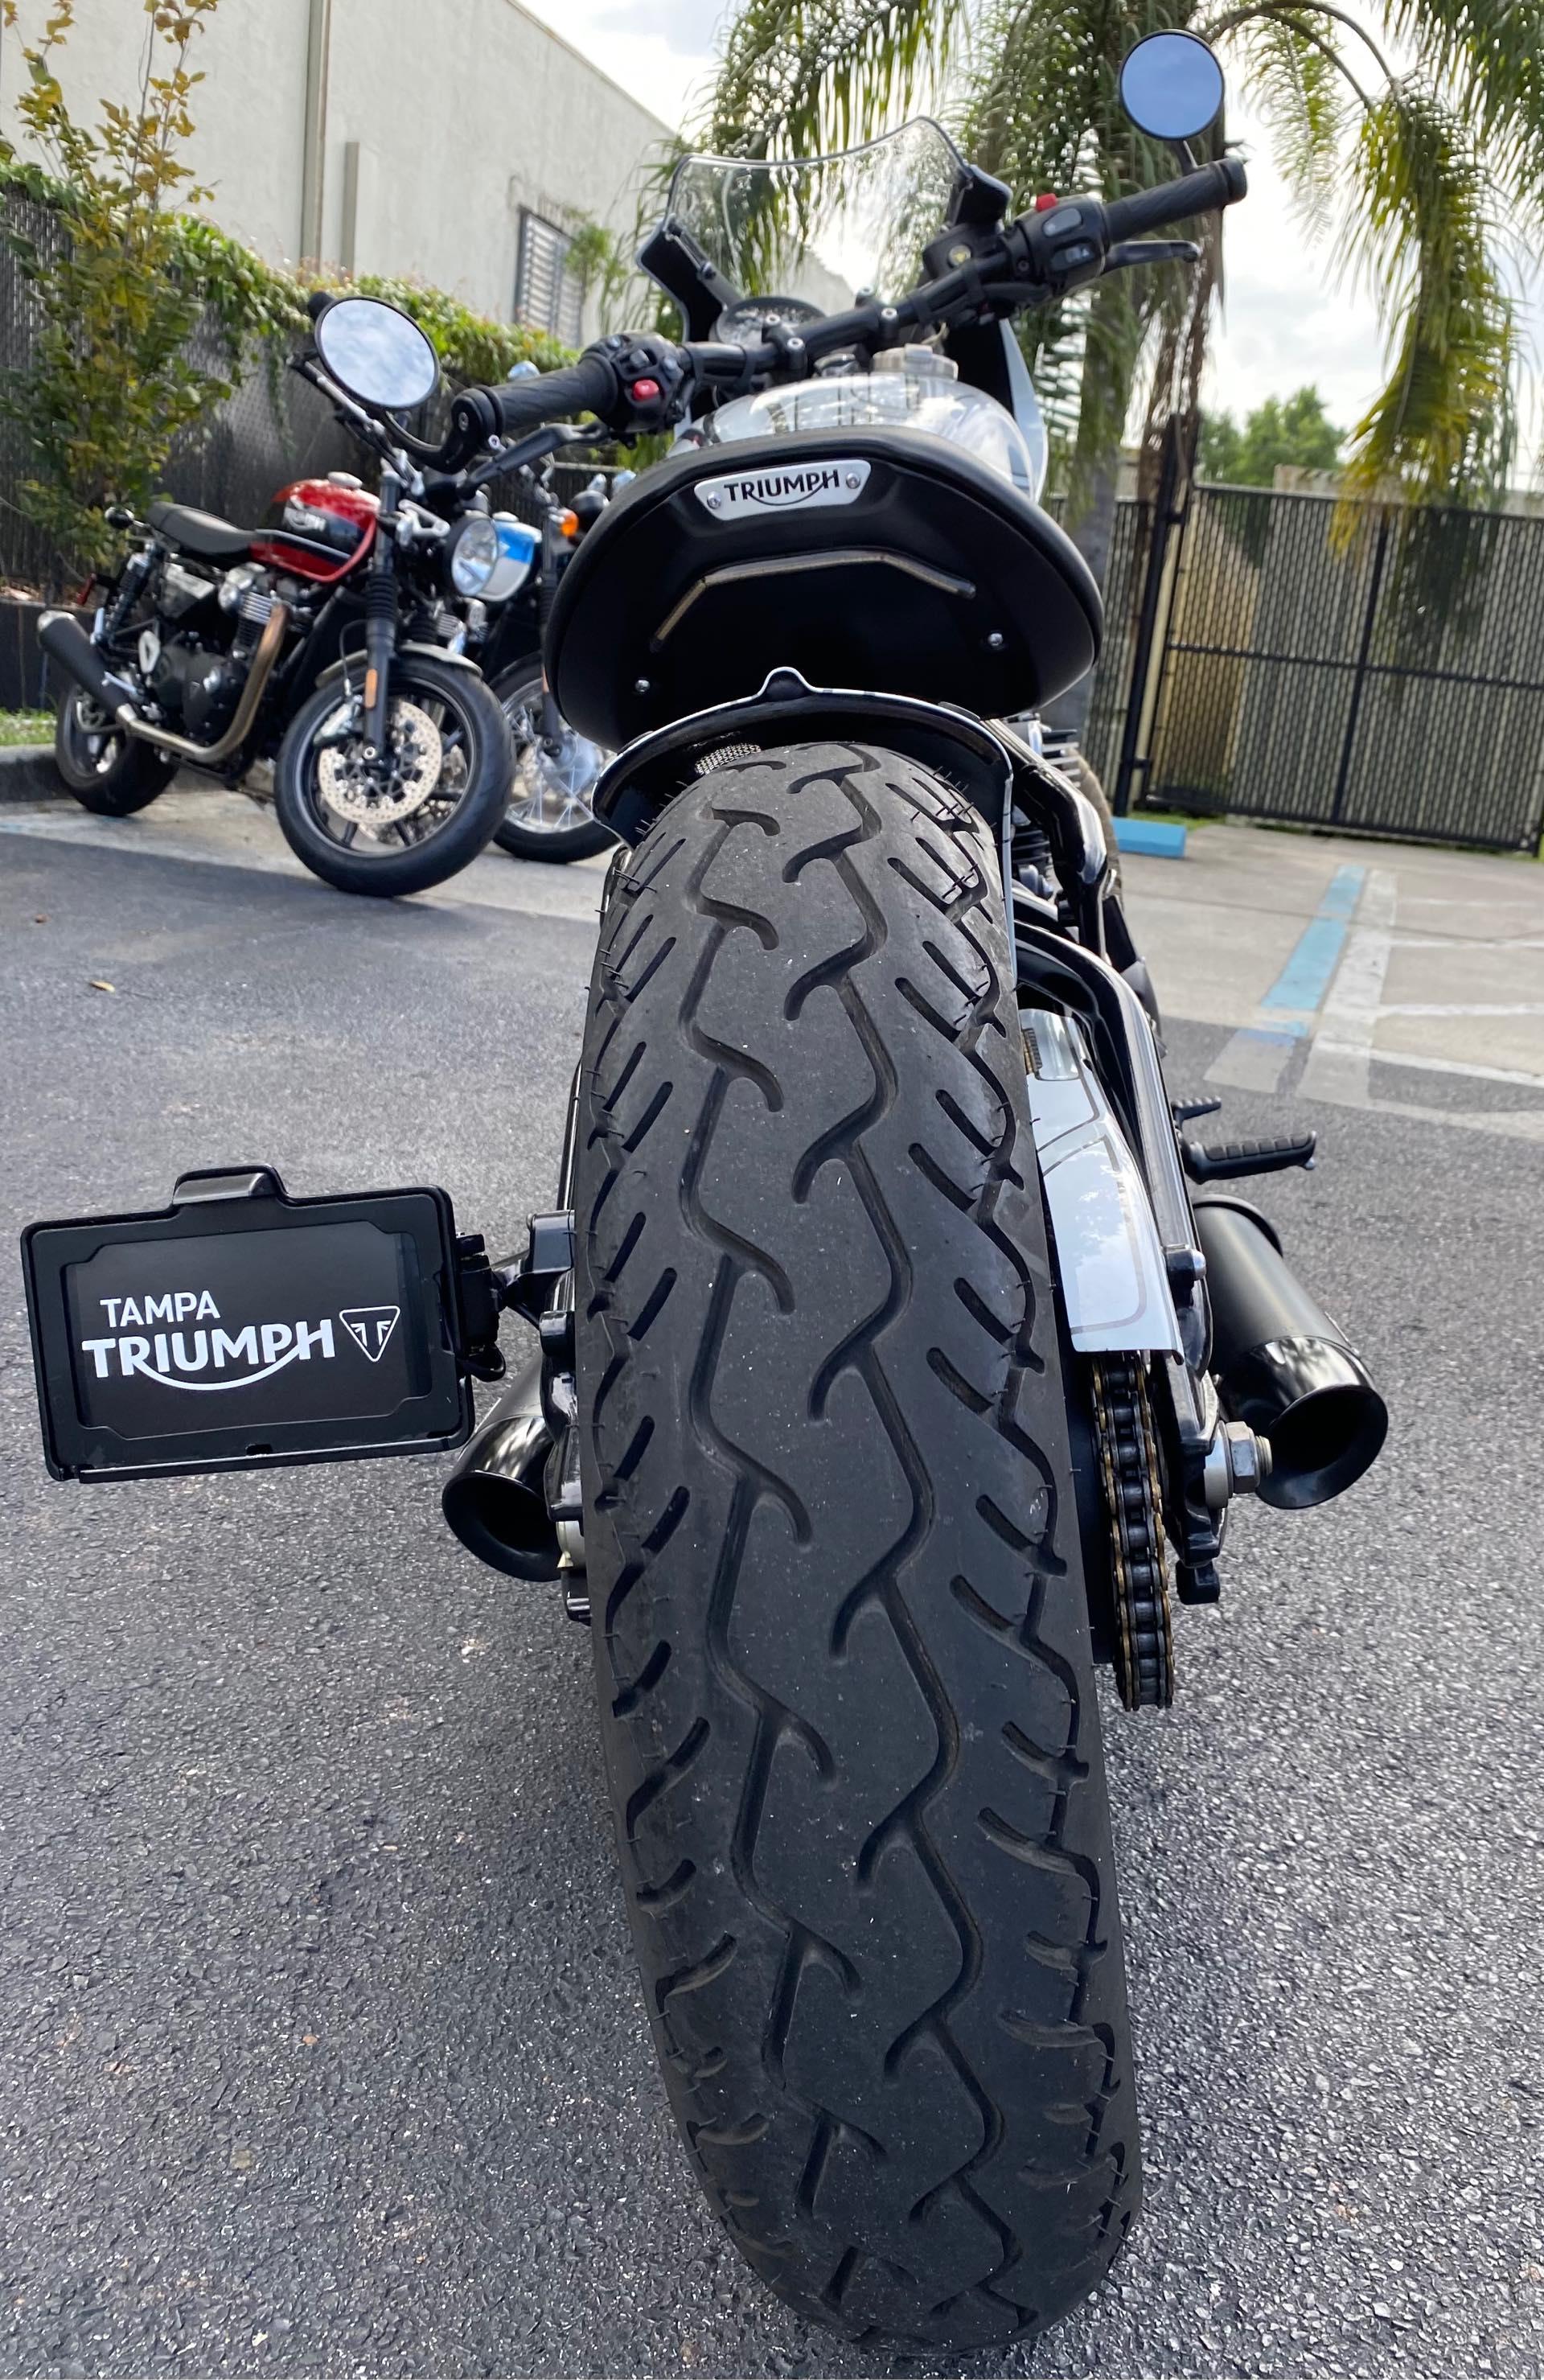 2018 Triumph Bonneville Bobber Black at Tampa Triumph, Tampa, FL 33614